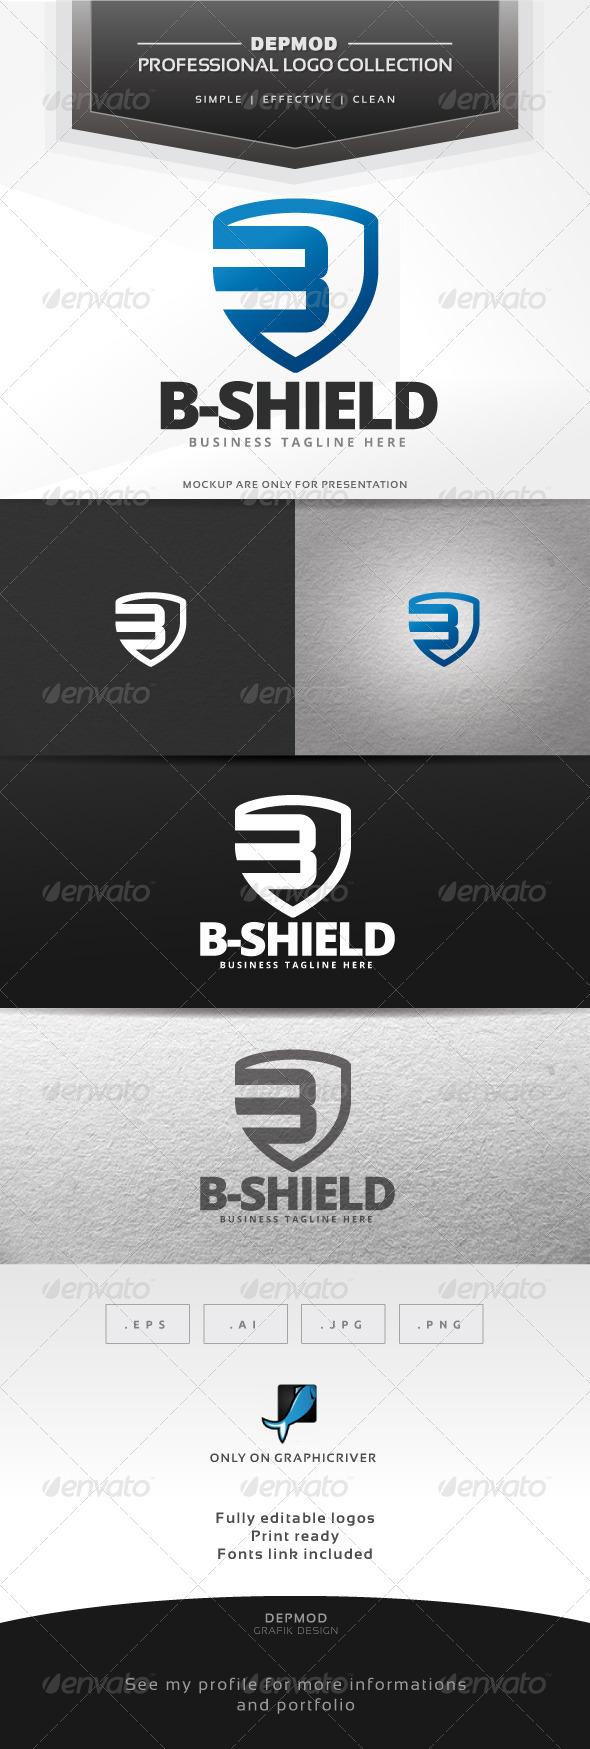 B-Shield Logo